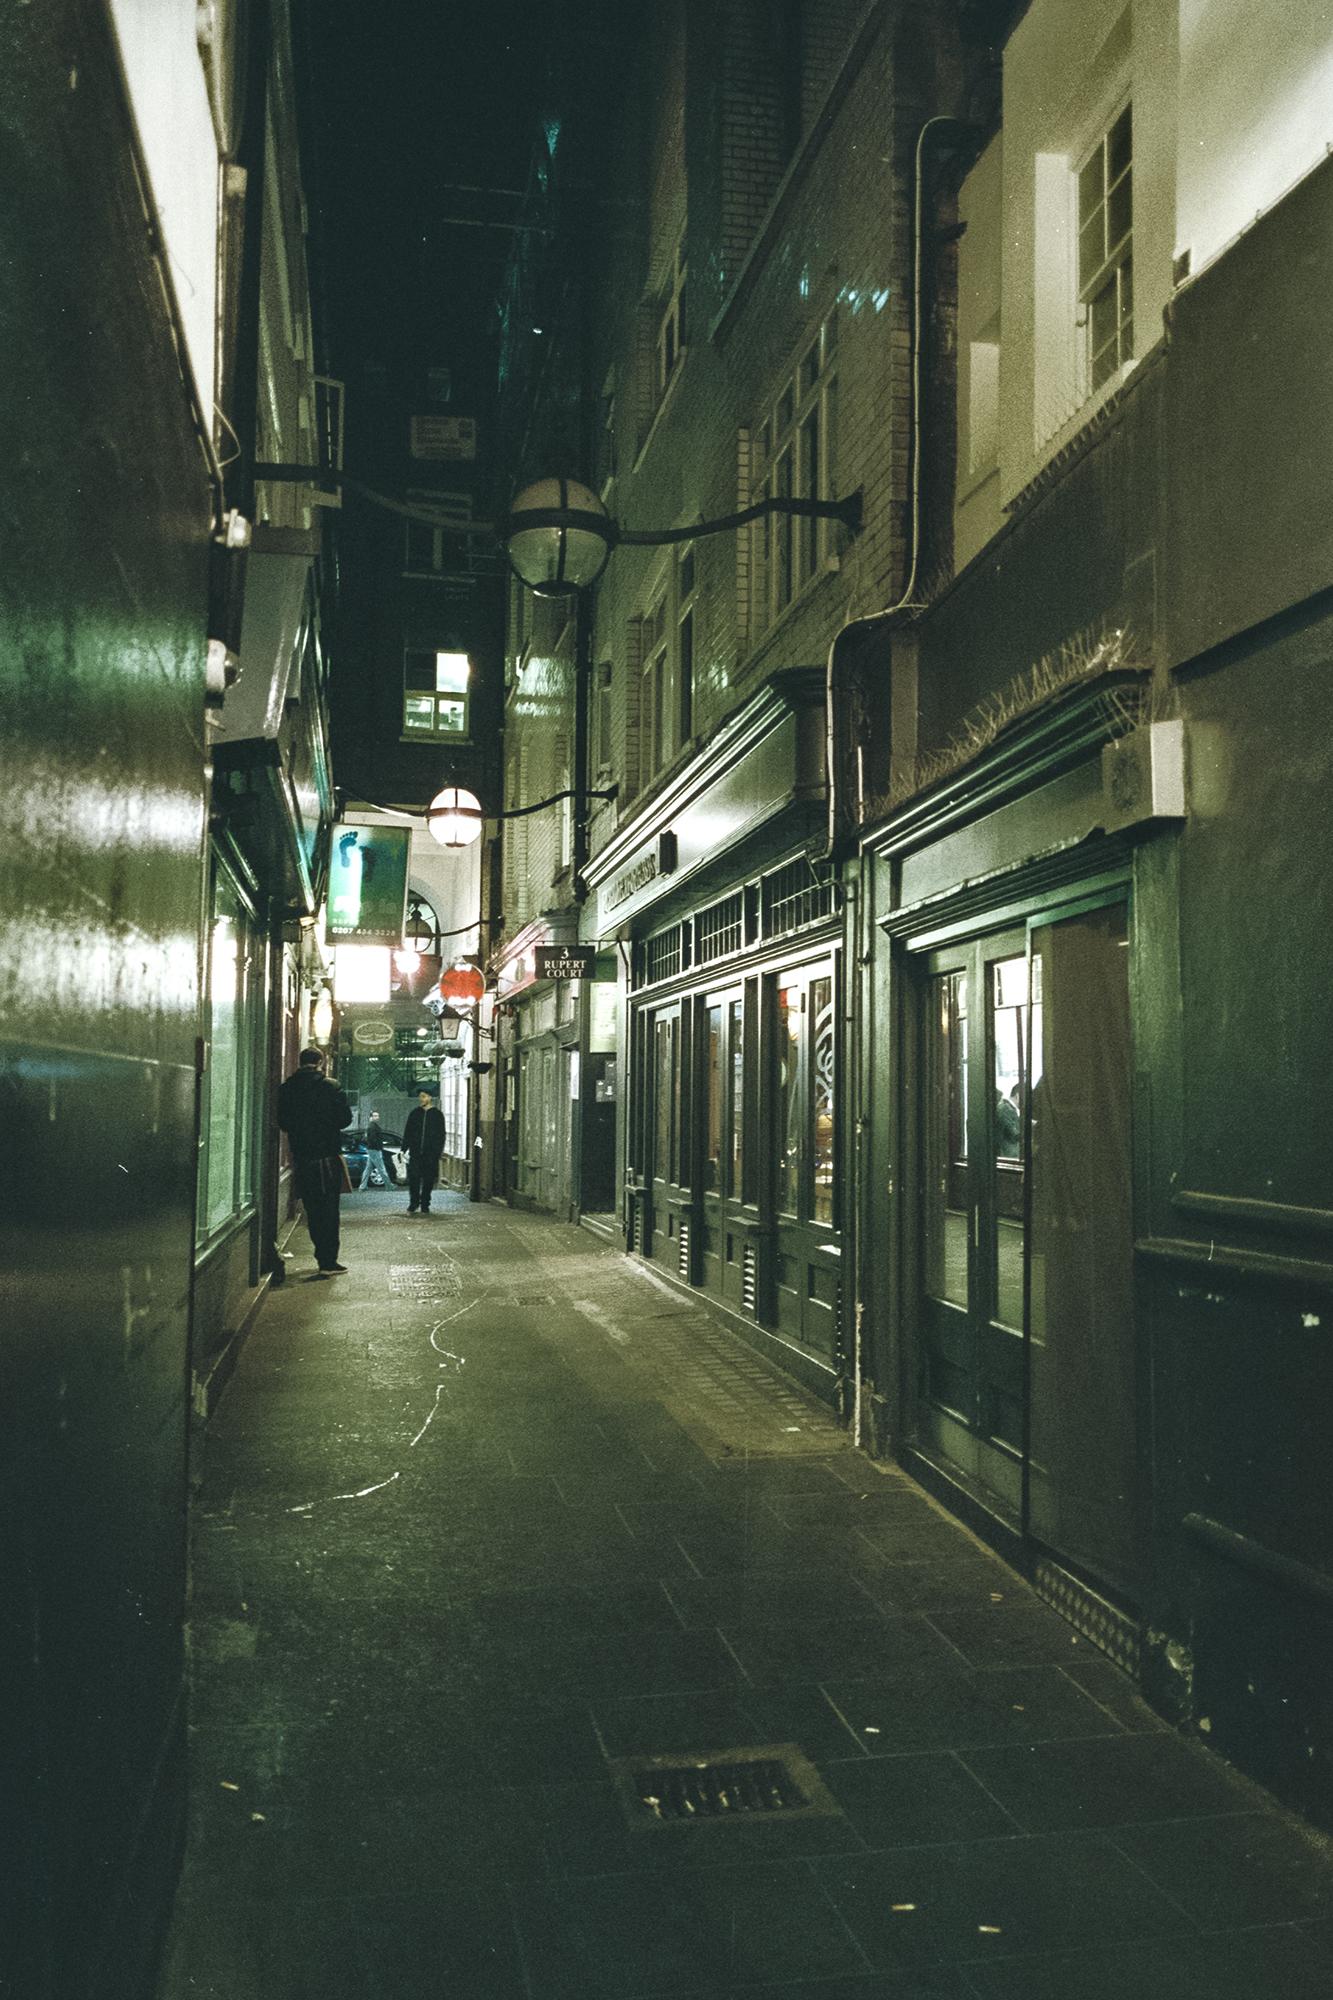 Oscar-arribas-photography-fotografo-portrait-retrato-editorial-london-street-photography-urbana-londres-film-analog-35mm-night-nocturna-54.jpg